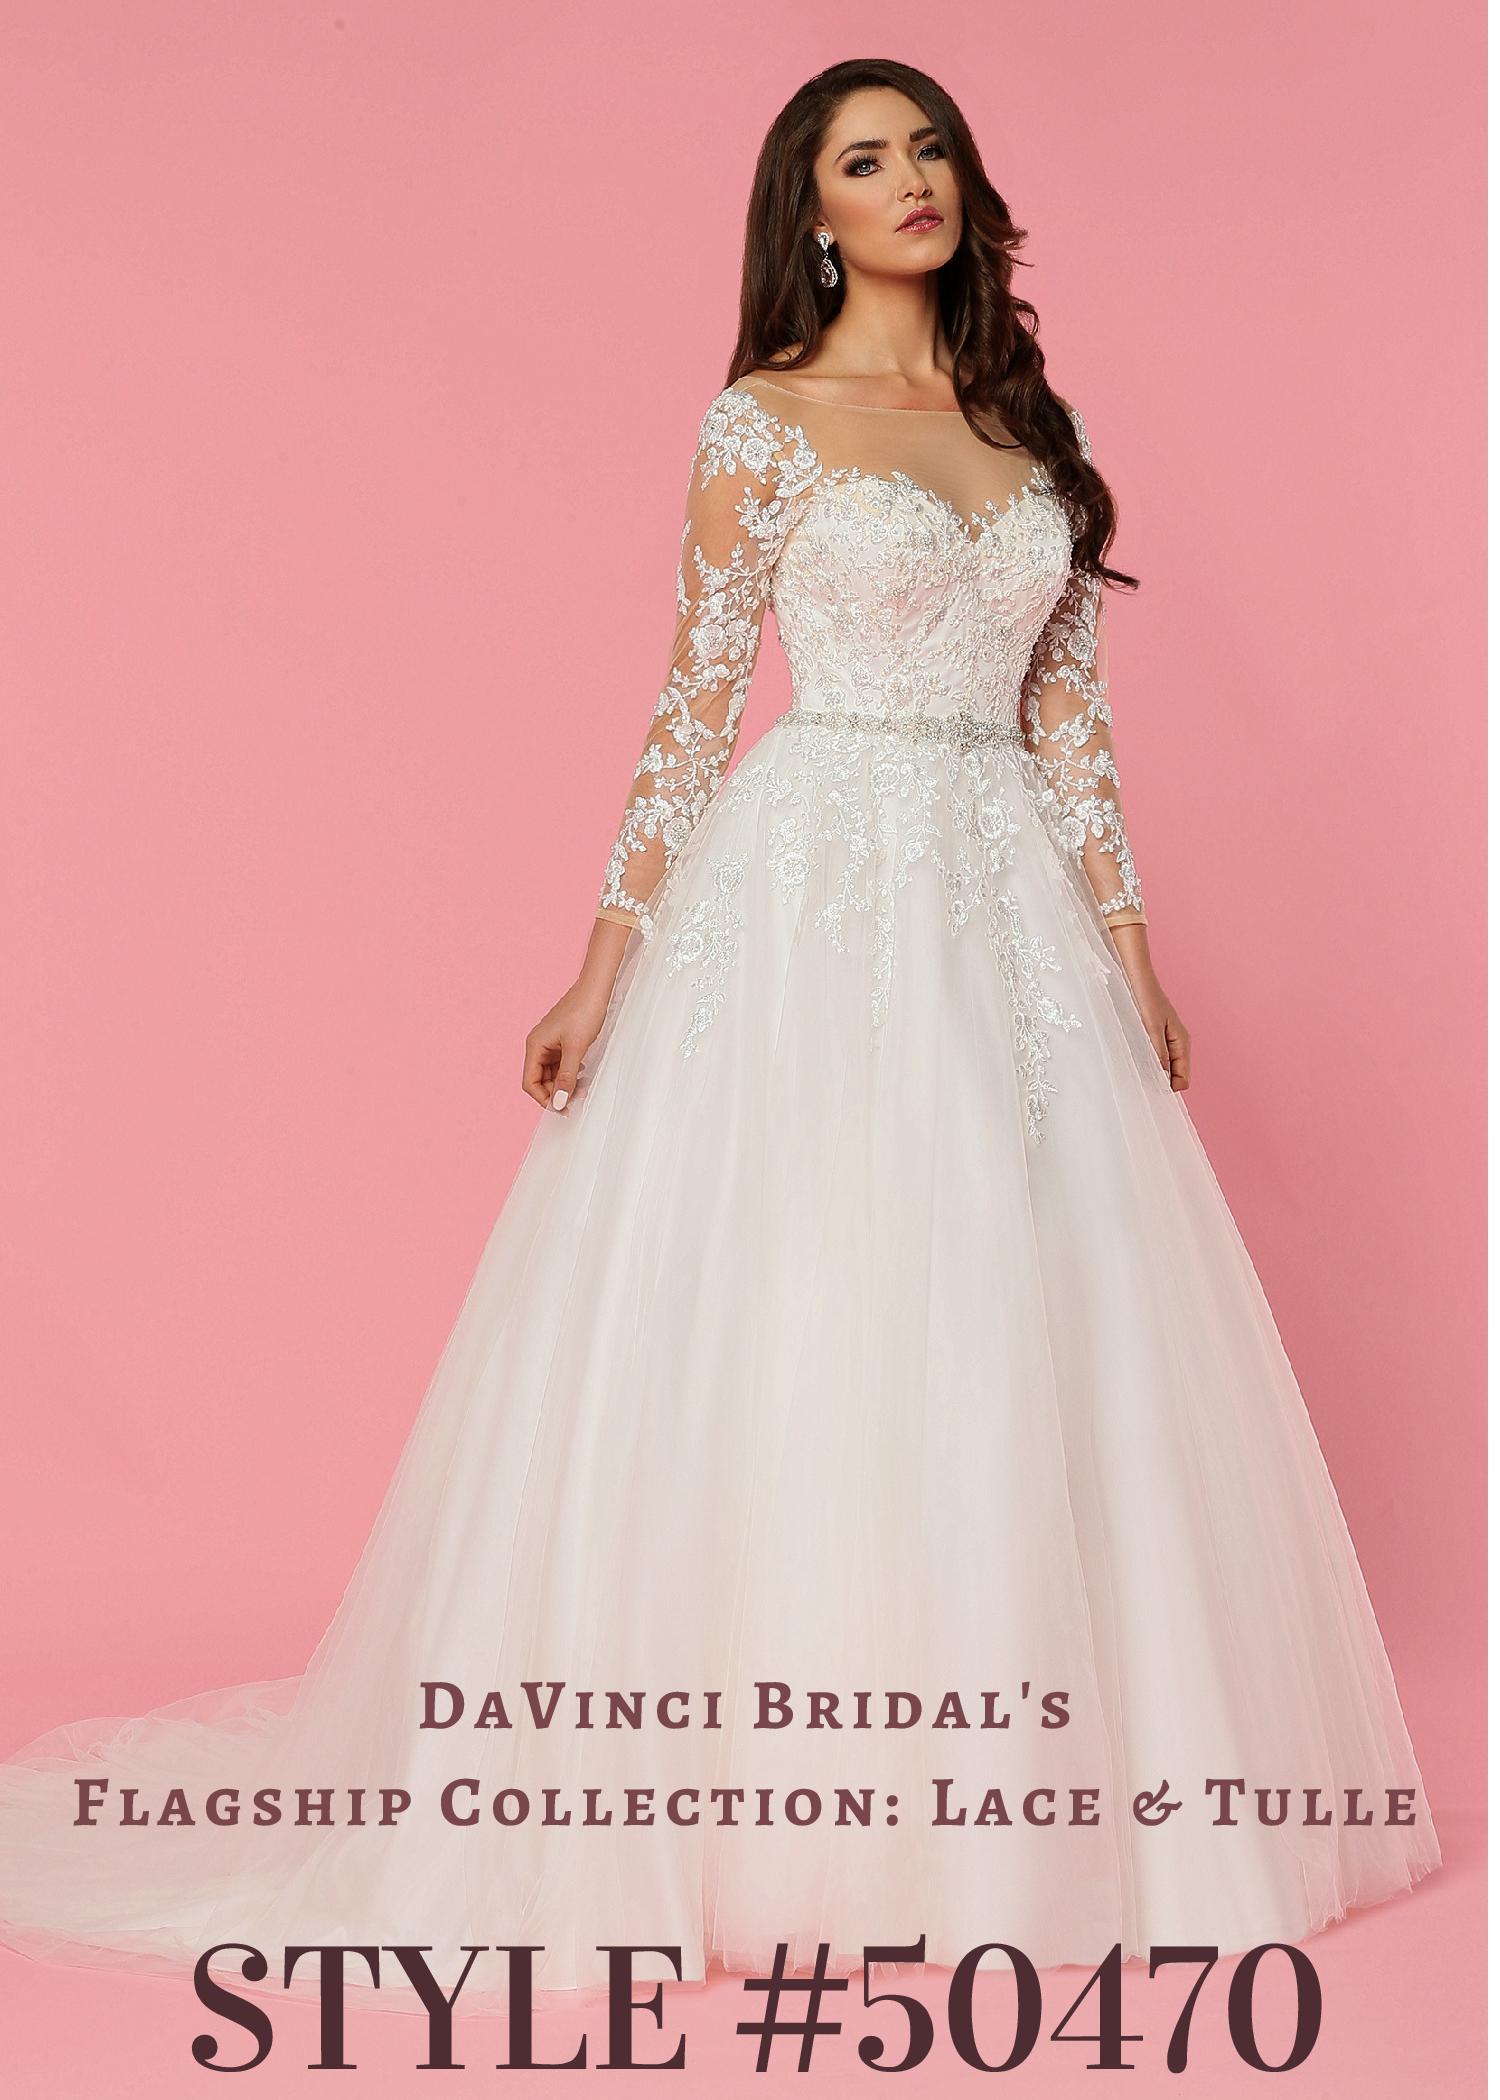 DaVinci Wedding Dresses | Style 50470 | Tulle & Lace – DaVinci ...